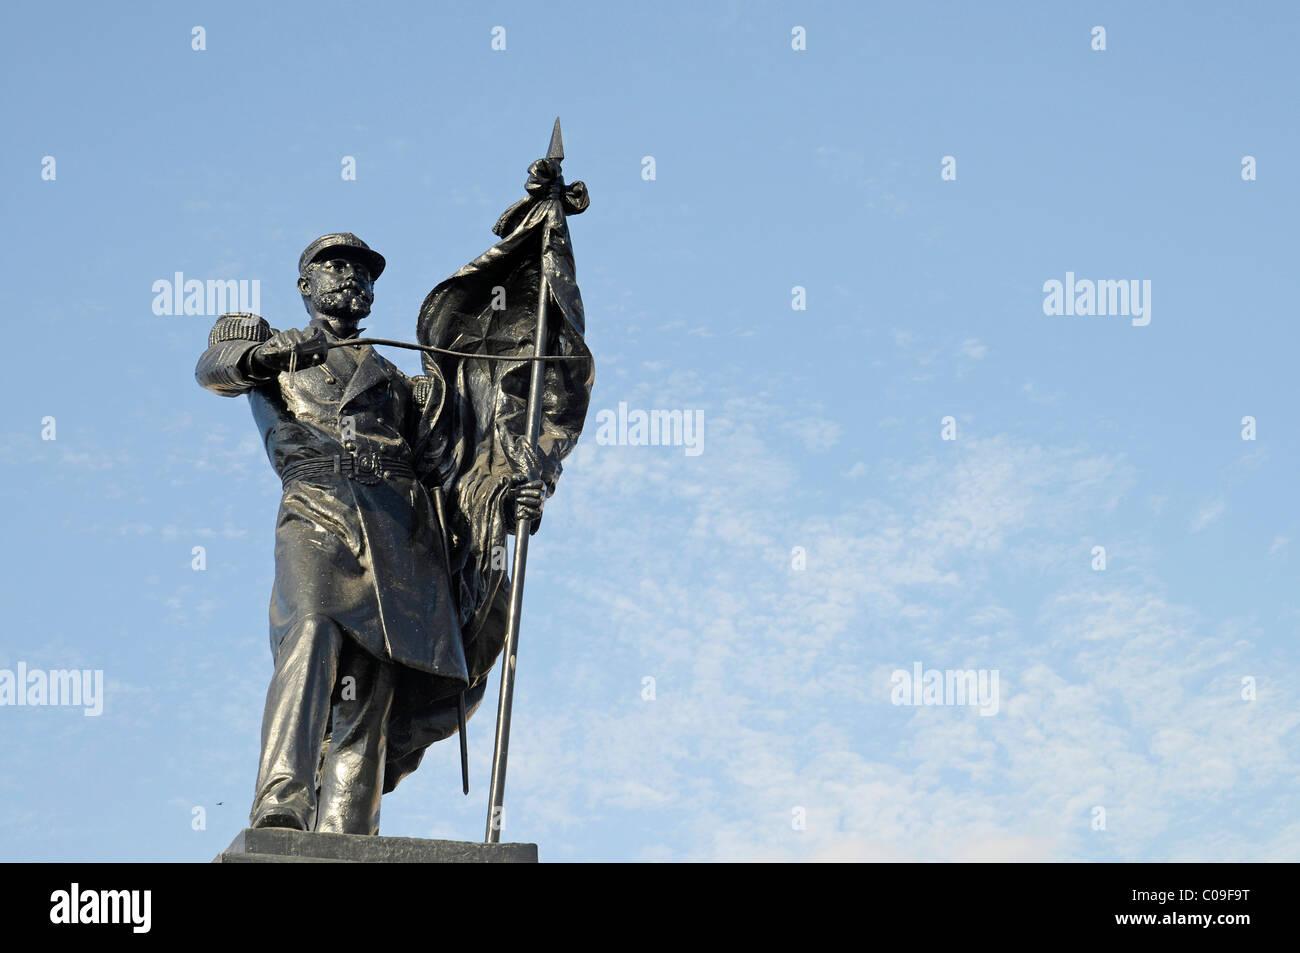 Monument to national war hero Captain Arturo Prat Chacon, Iquique, Norte Grande region, Northern Chile, Chile, South - Stock Image